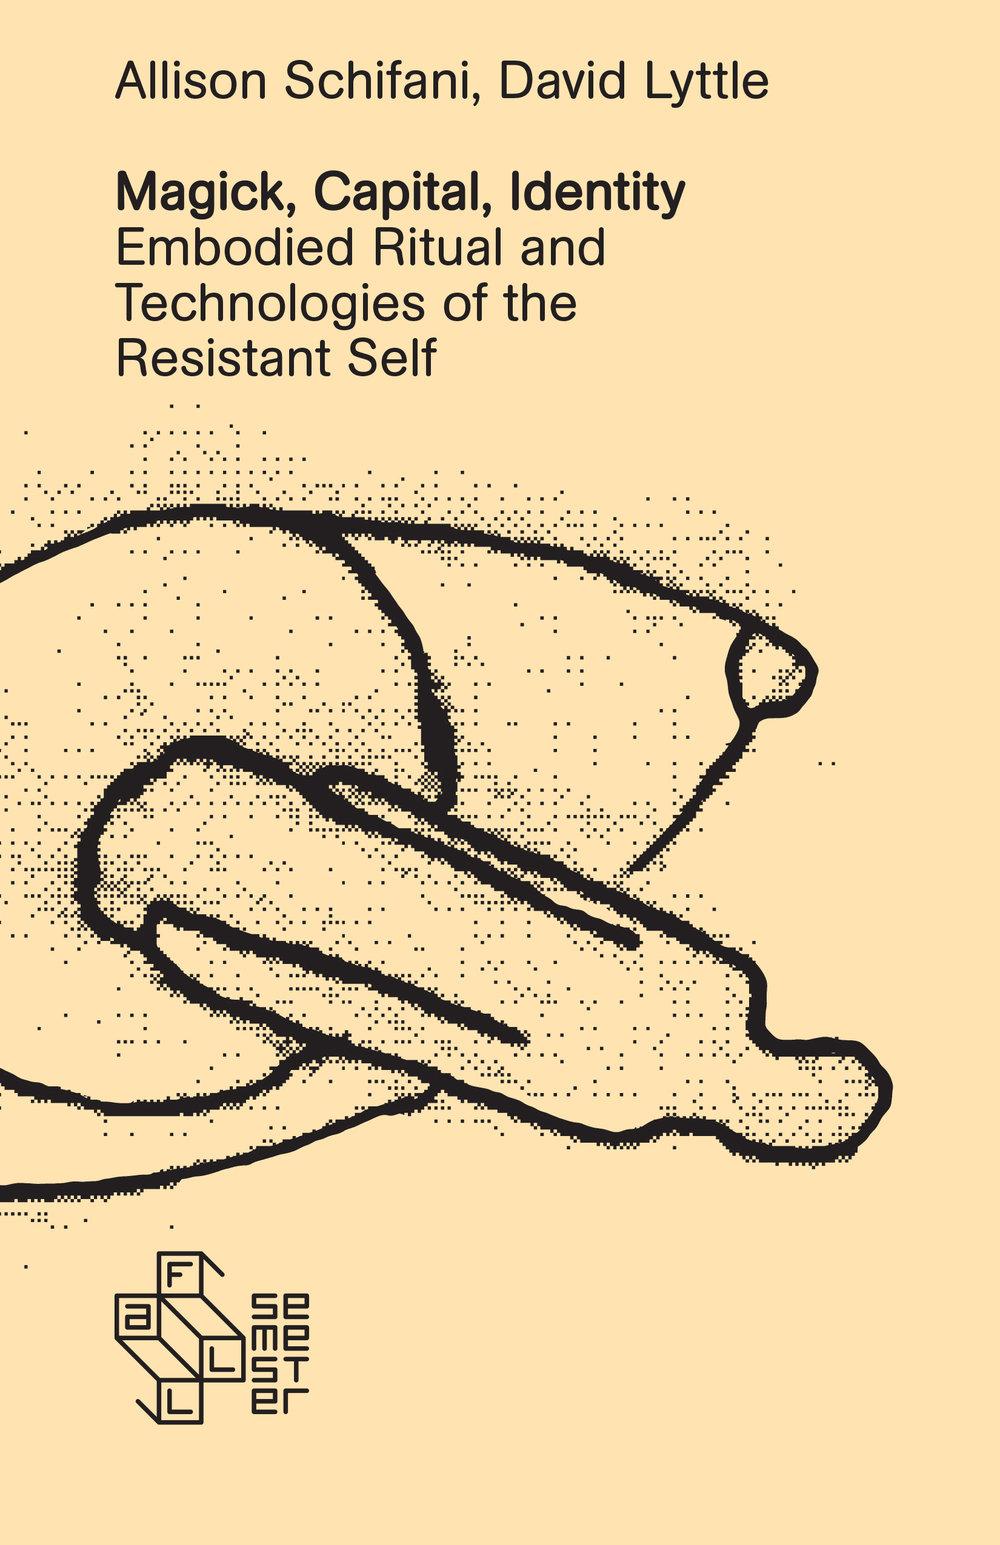 SCHIFANI-LYTTLE-Booklet-1.jpg